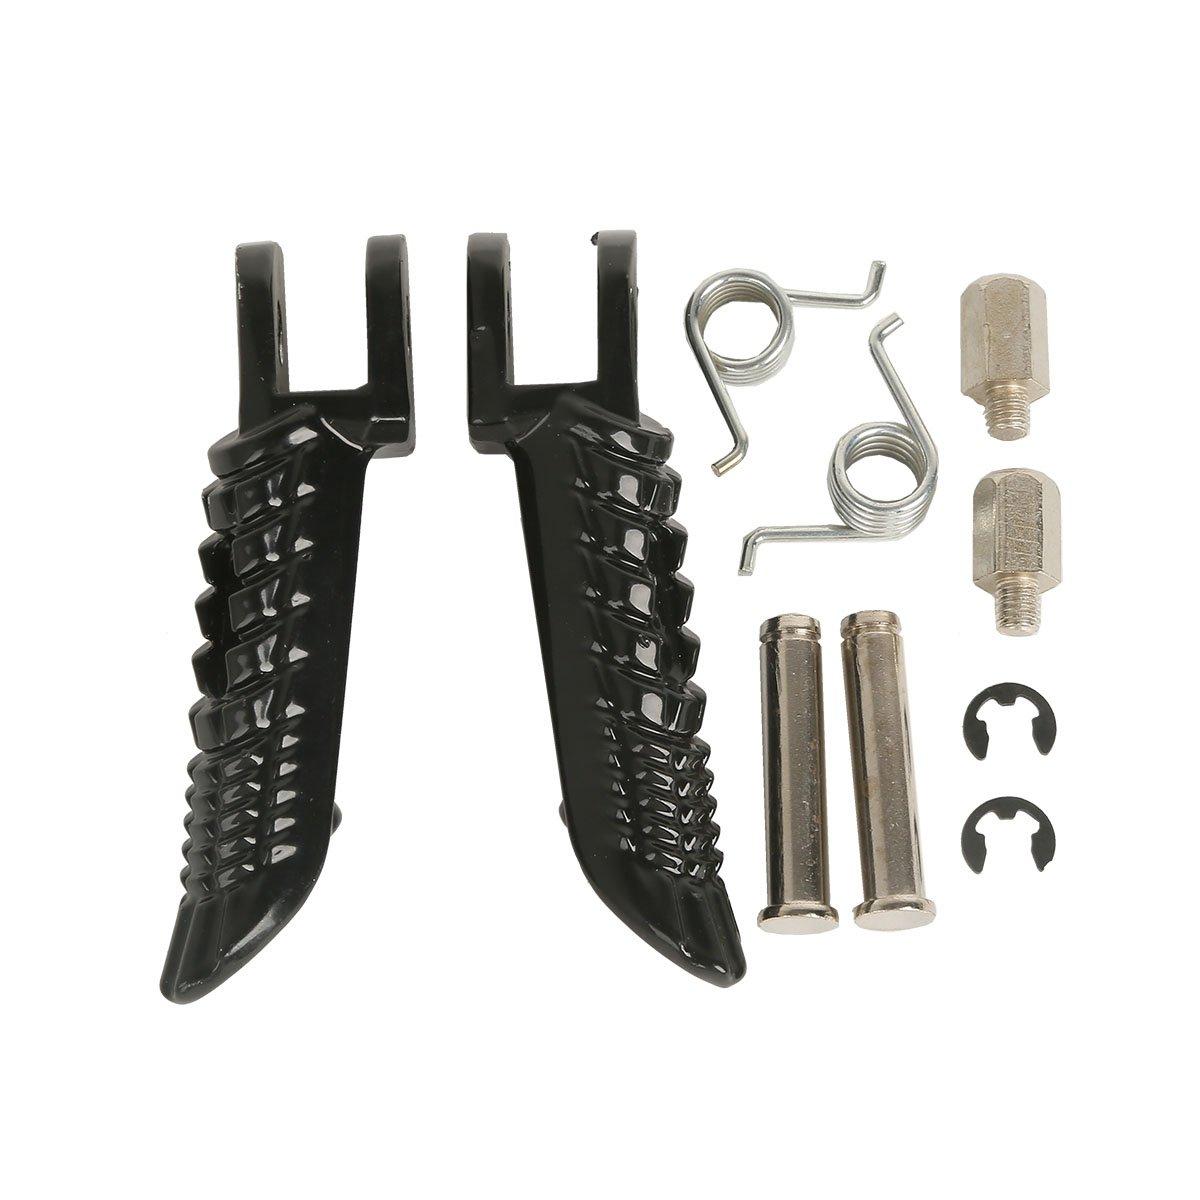 TCMT Black Front Foot Pegs Motorcycle Footpeg Footrest Bracket Set Fits For Suzuki GSXR600 GSXR 600 2001 2002 2003 2004 2005 2006 2007 2008 2009 2010 2011 2012 2013 2014